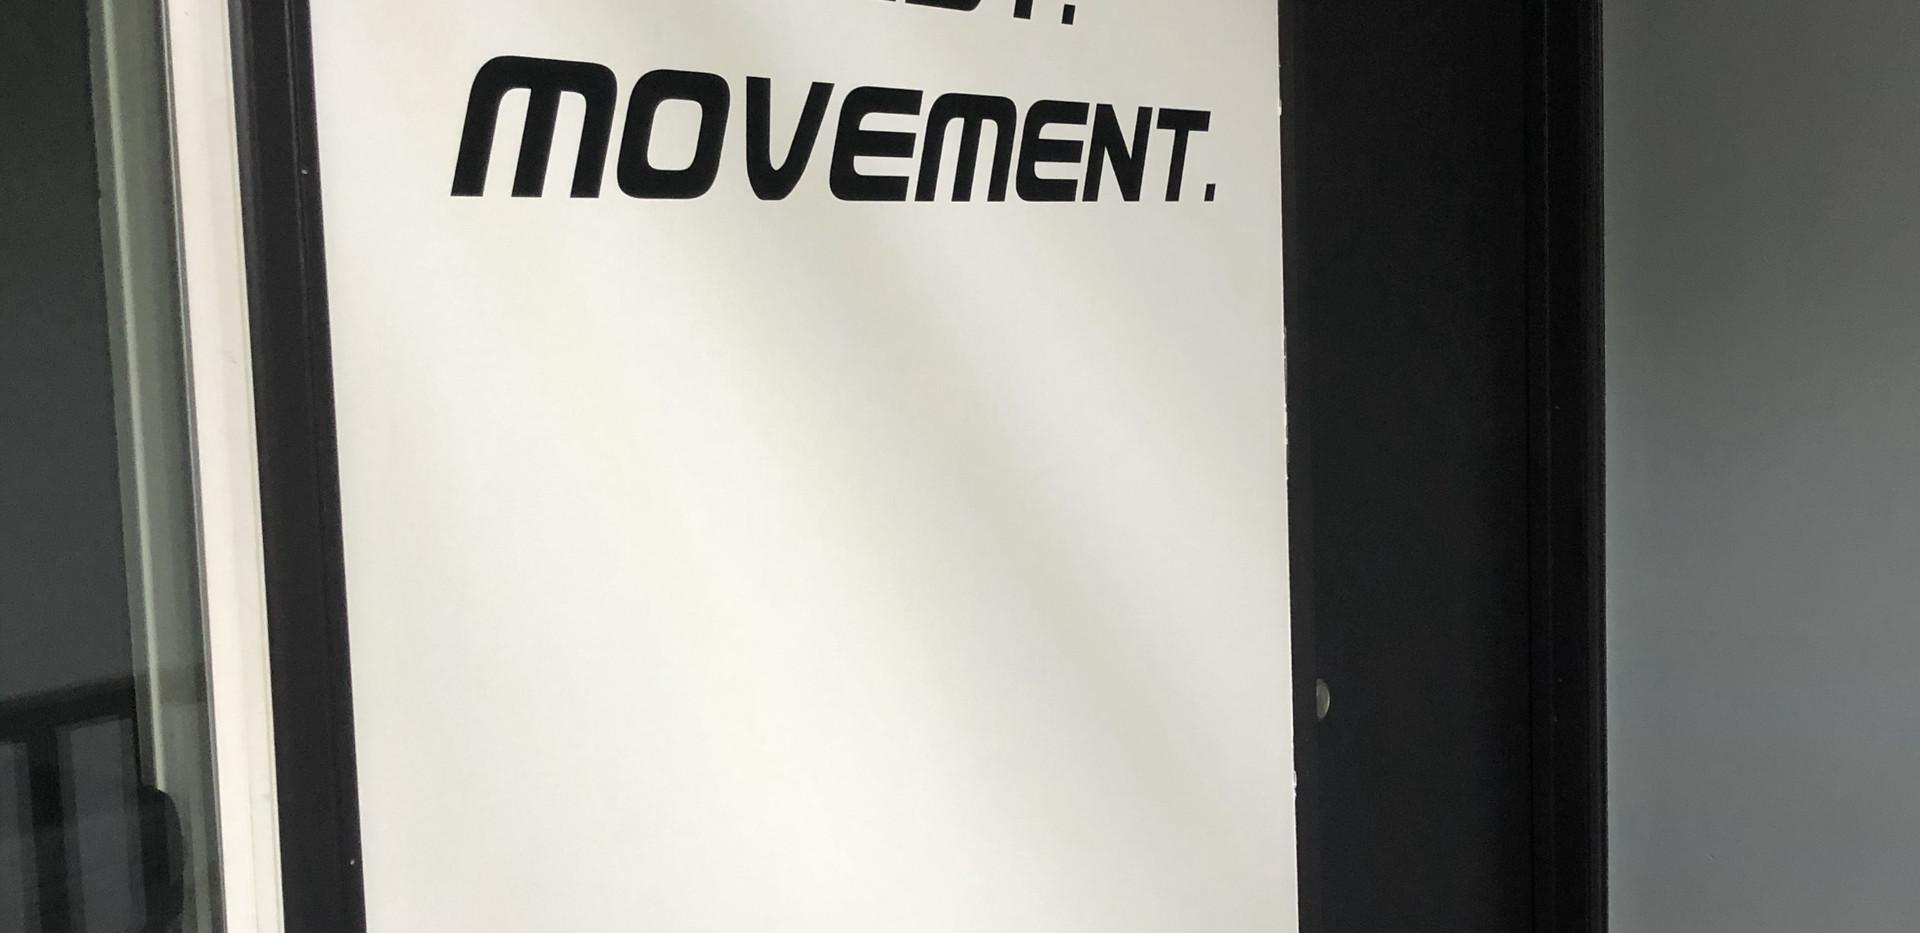 simplespeedcoach_experience-best-movemen